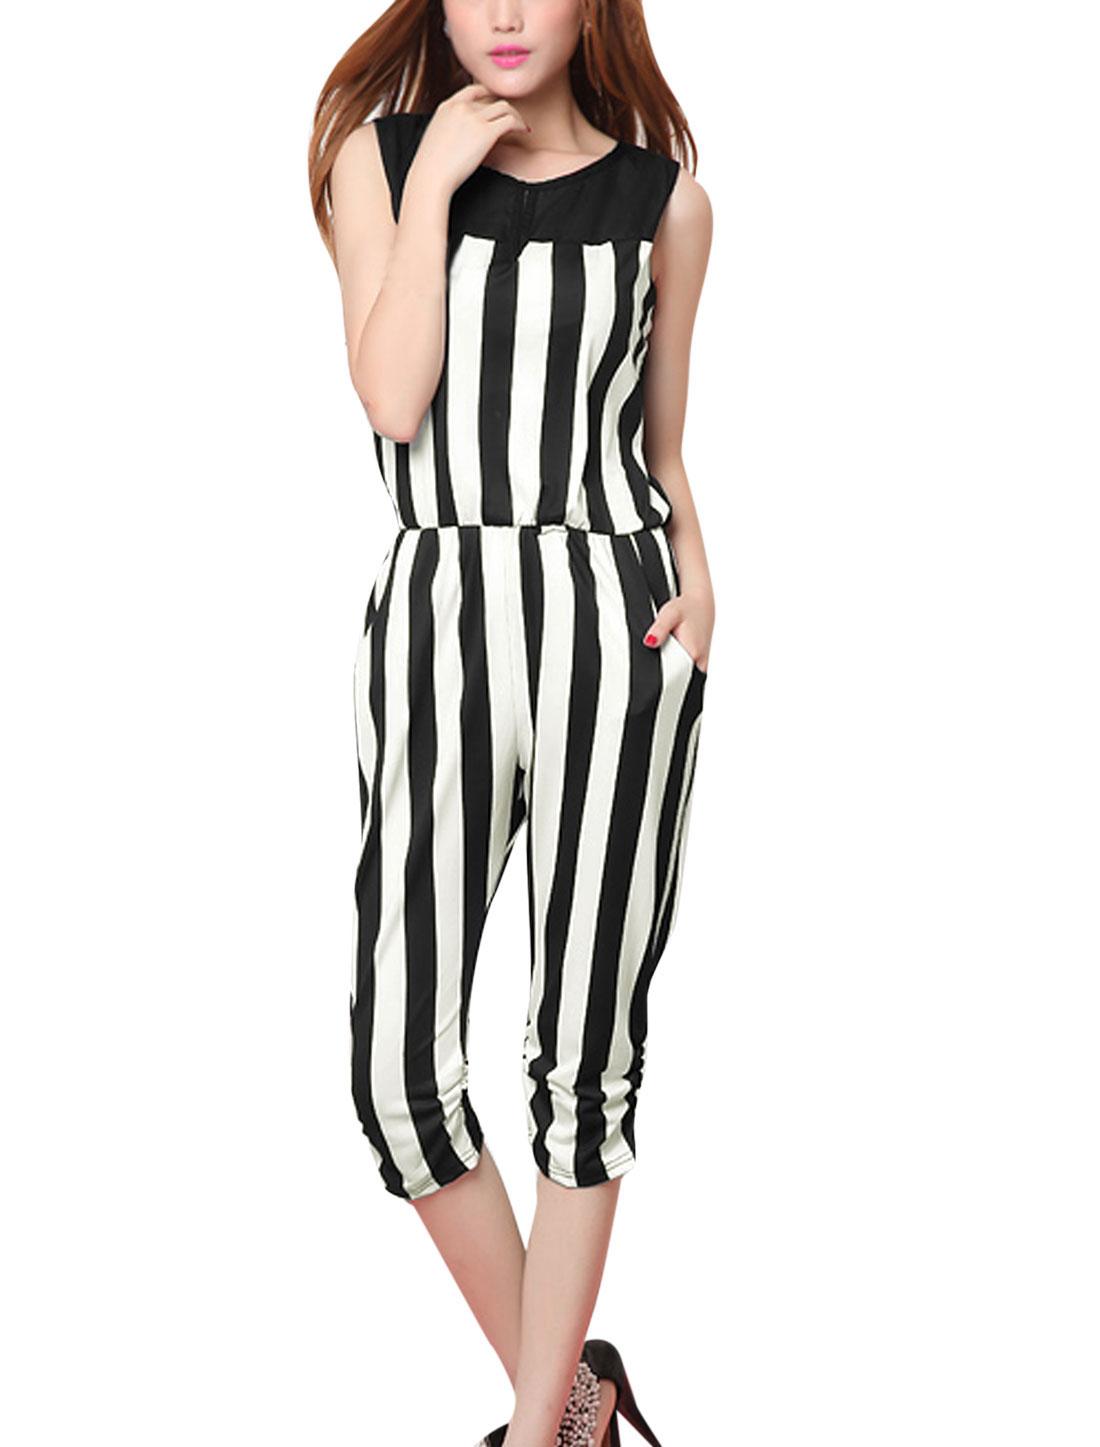 Ladies Vertical Stripes Pattern Cut Out Back Chic Jumpsuit Black White XS